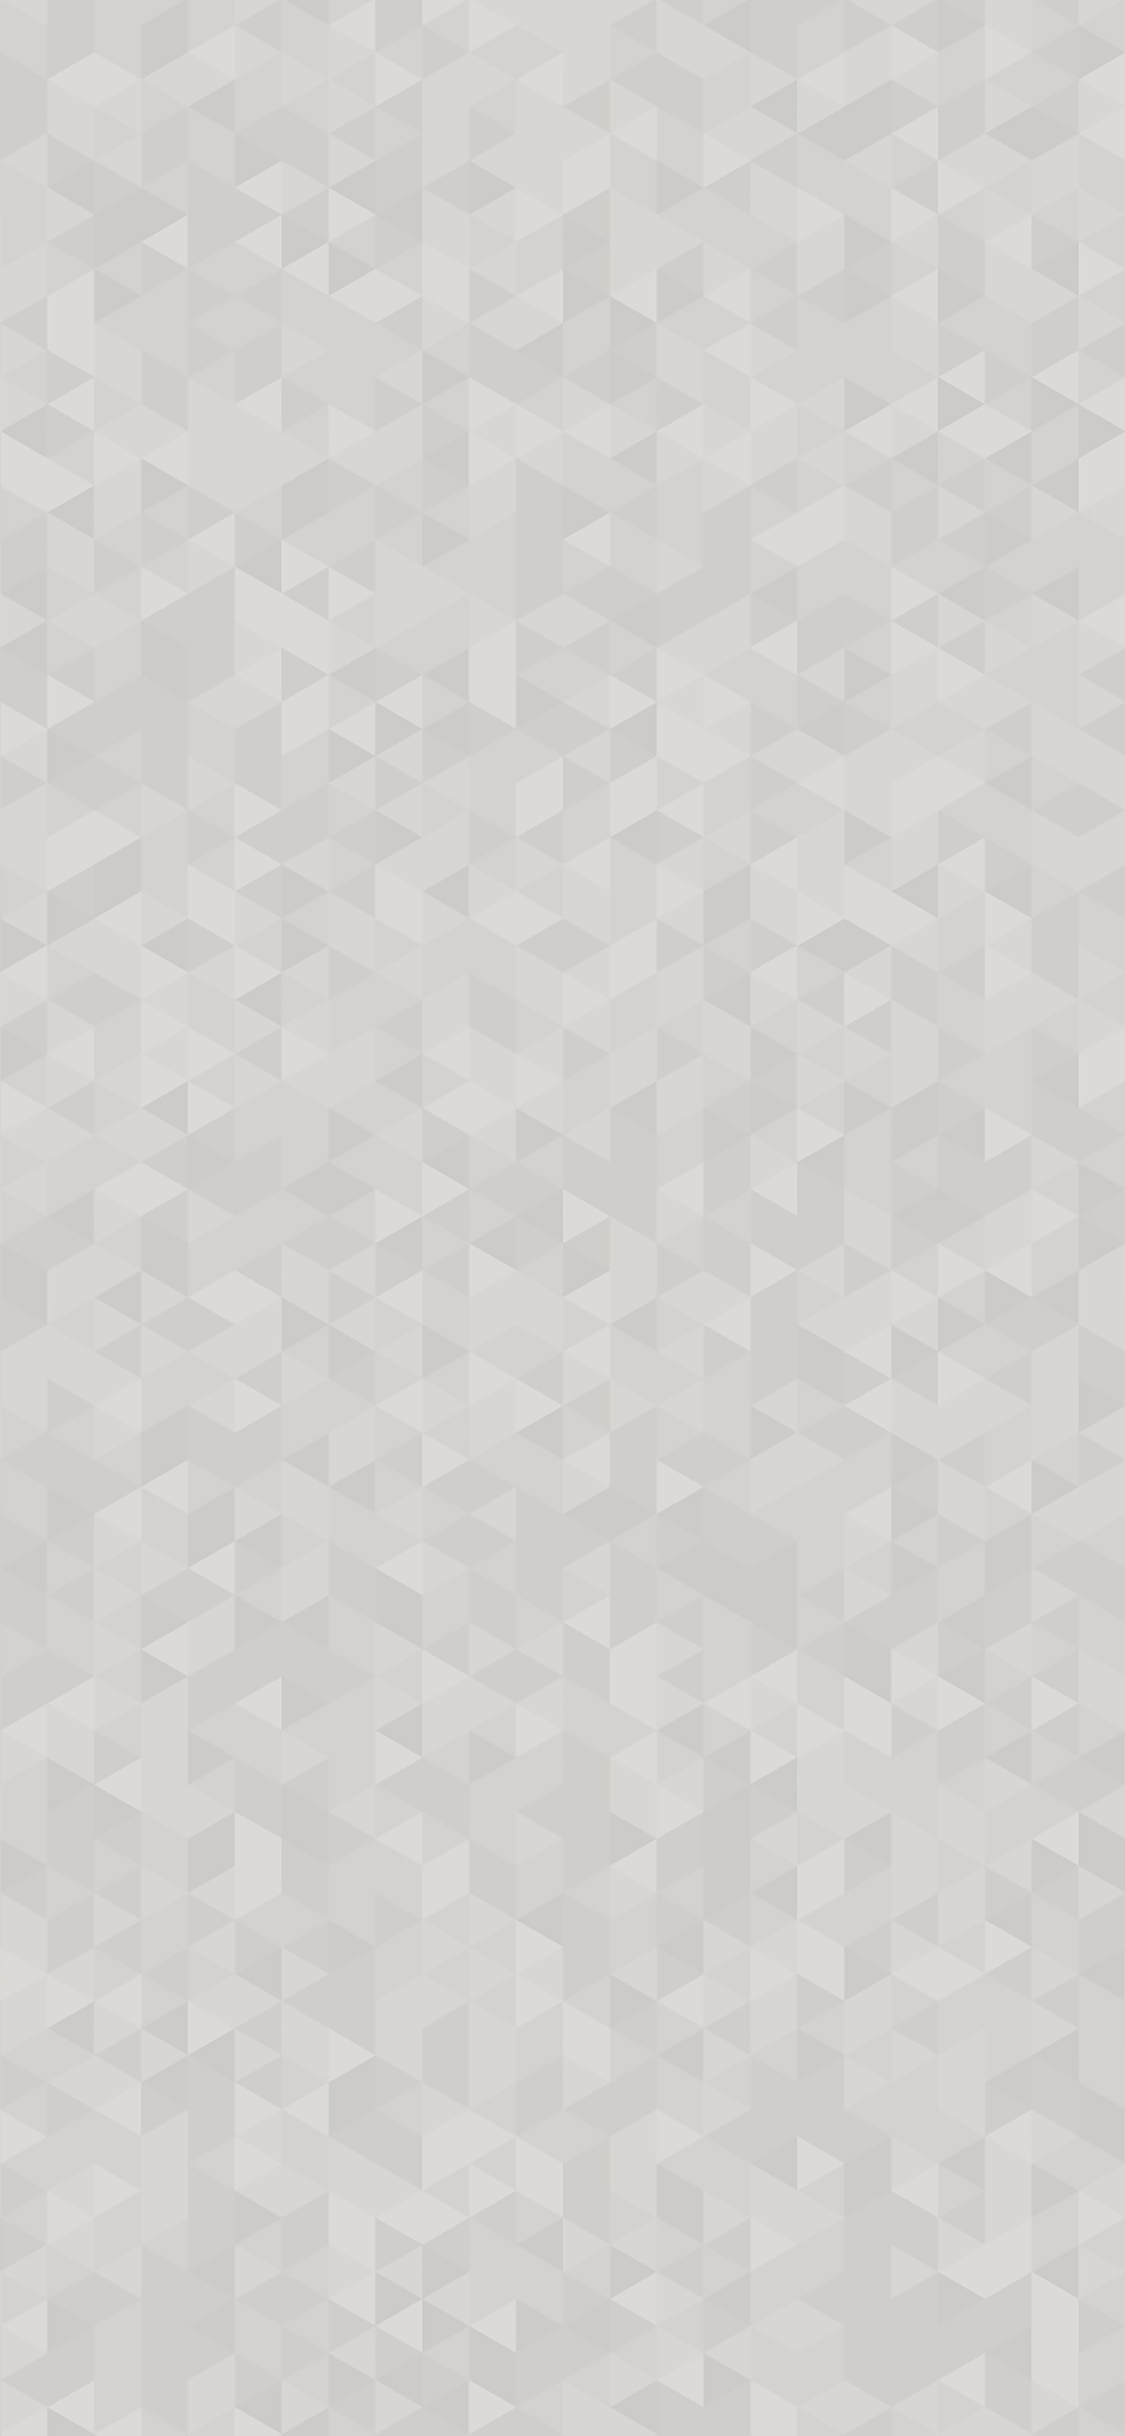 Vg46 Diamonds Abstract Art White Pattern Wallpaper